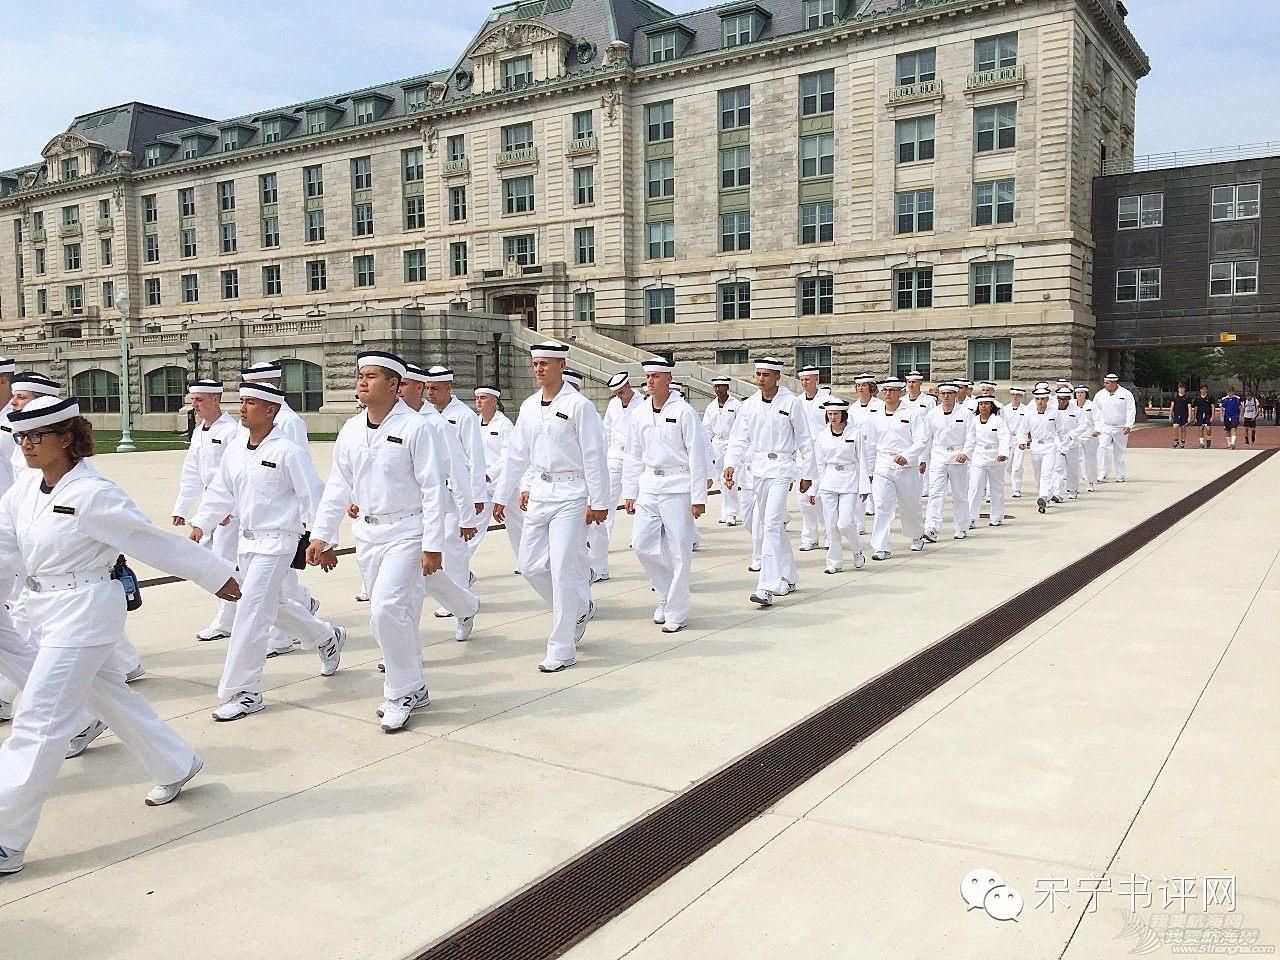 GO NAVY 安纳波利斯海军学院巡礼